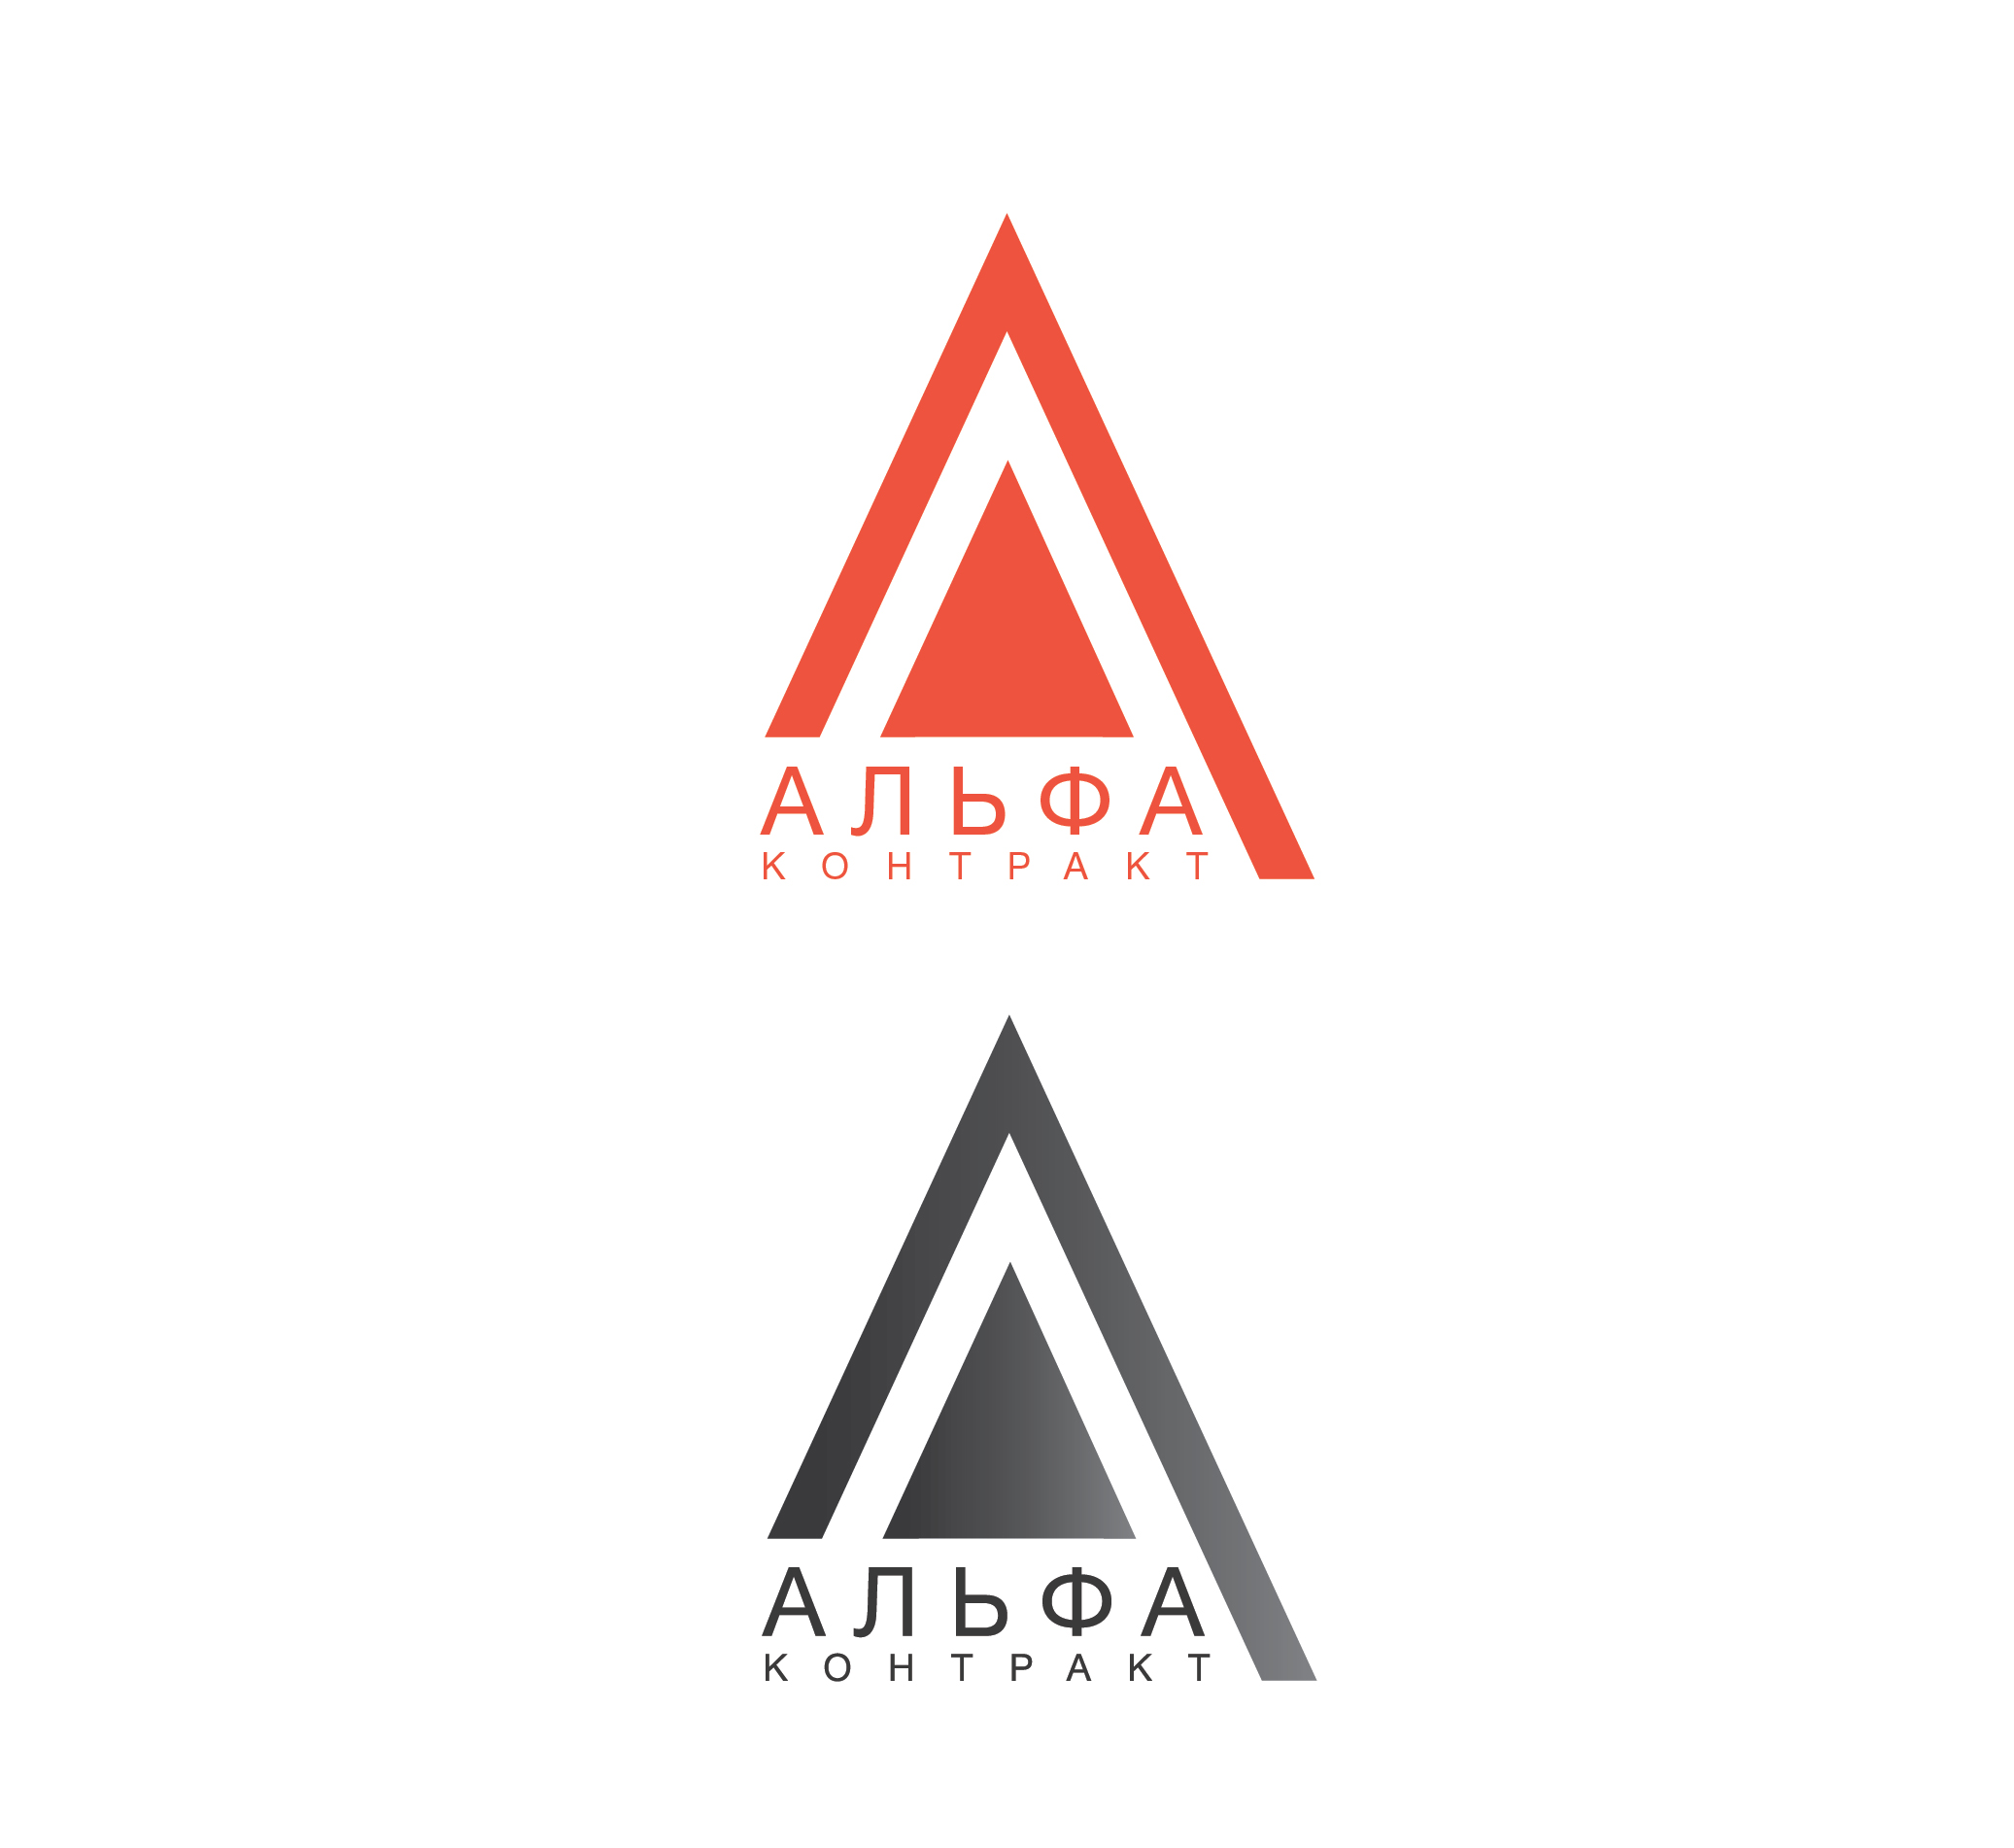 Дизайнер для разработки логотипа компании фото f_1265bf69265b071c.jpg